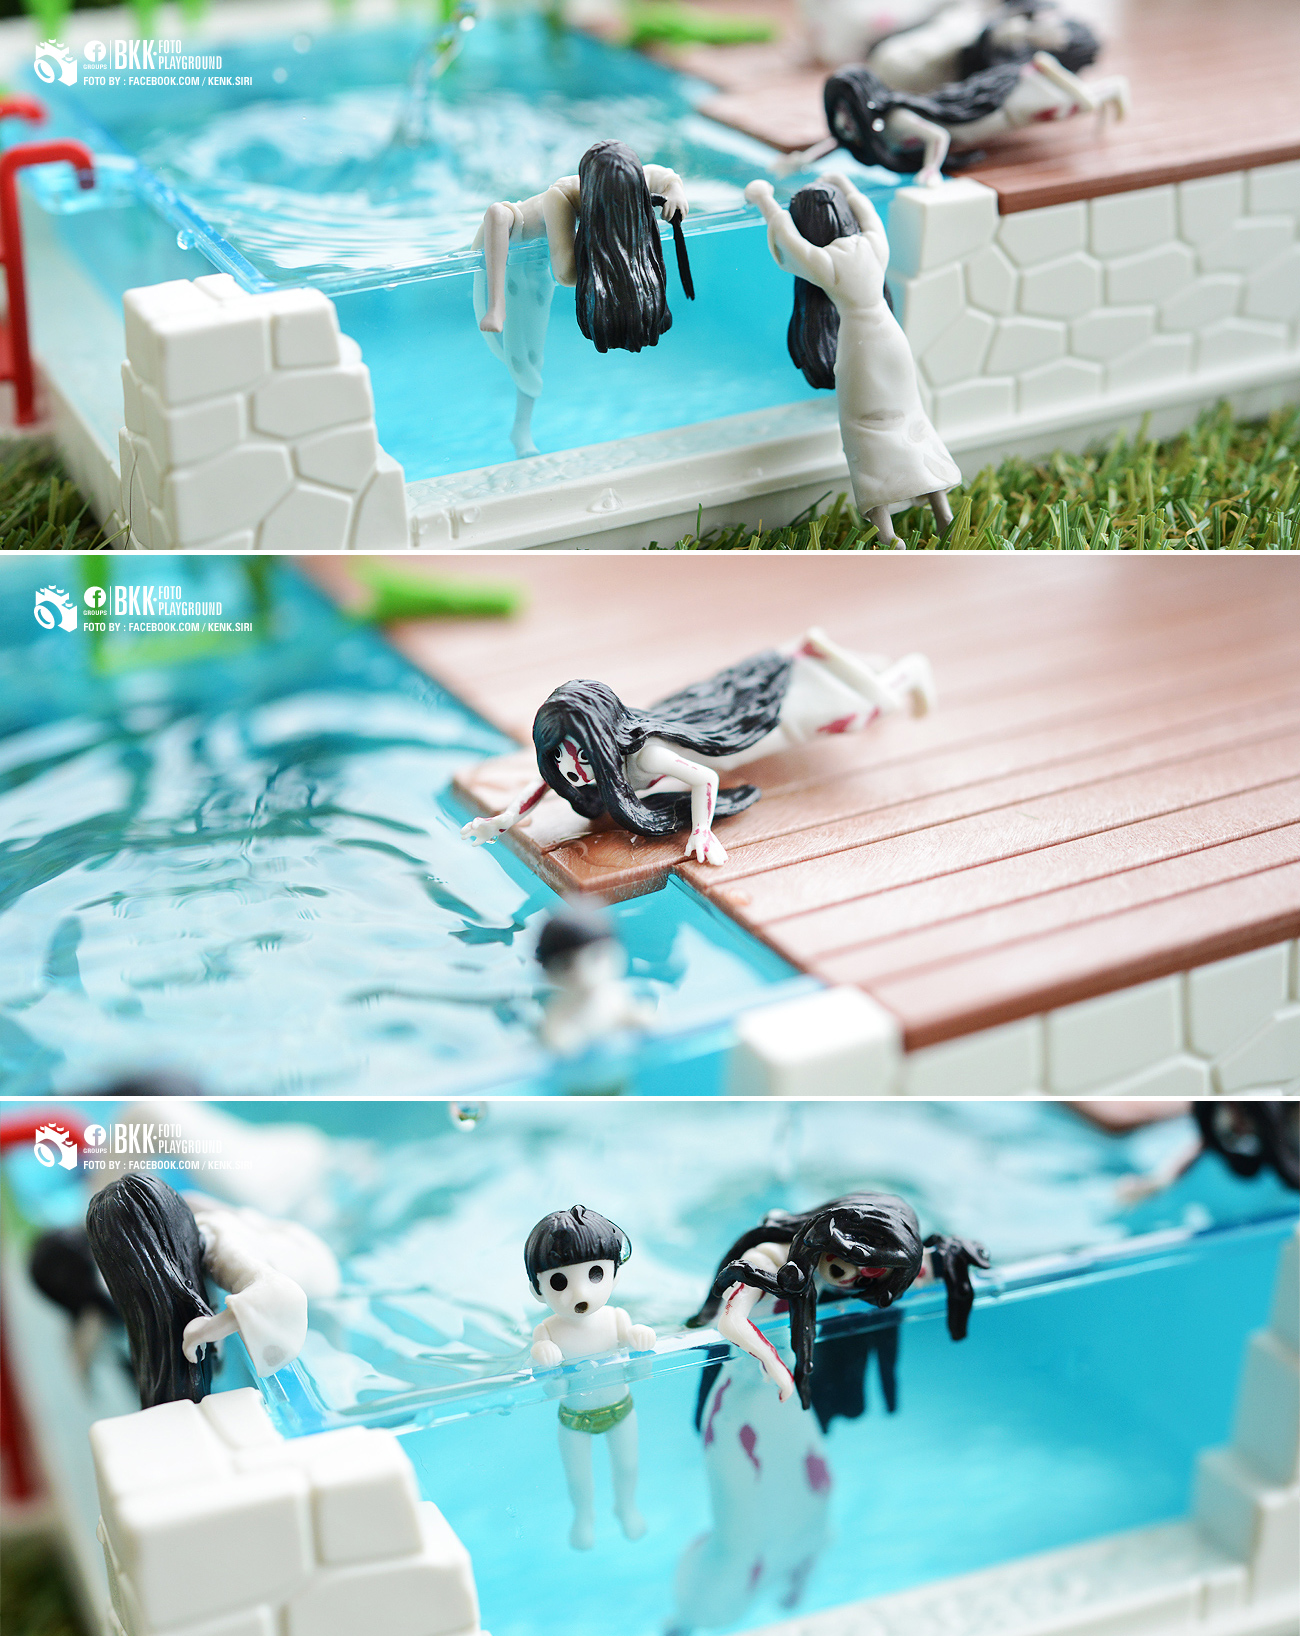 model figure figurine figures pool toys kadokawa yamamura_sadako sadako putitto_series sadako_vs_kayako putitto_series_sadako_vs_kayako saeki_kayako saeki_toshio toyphotography, thai kenk.siri putitto kayako ju-on